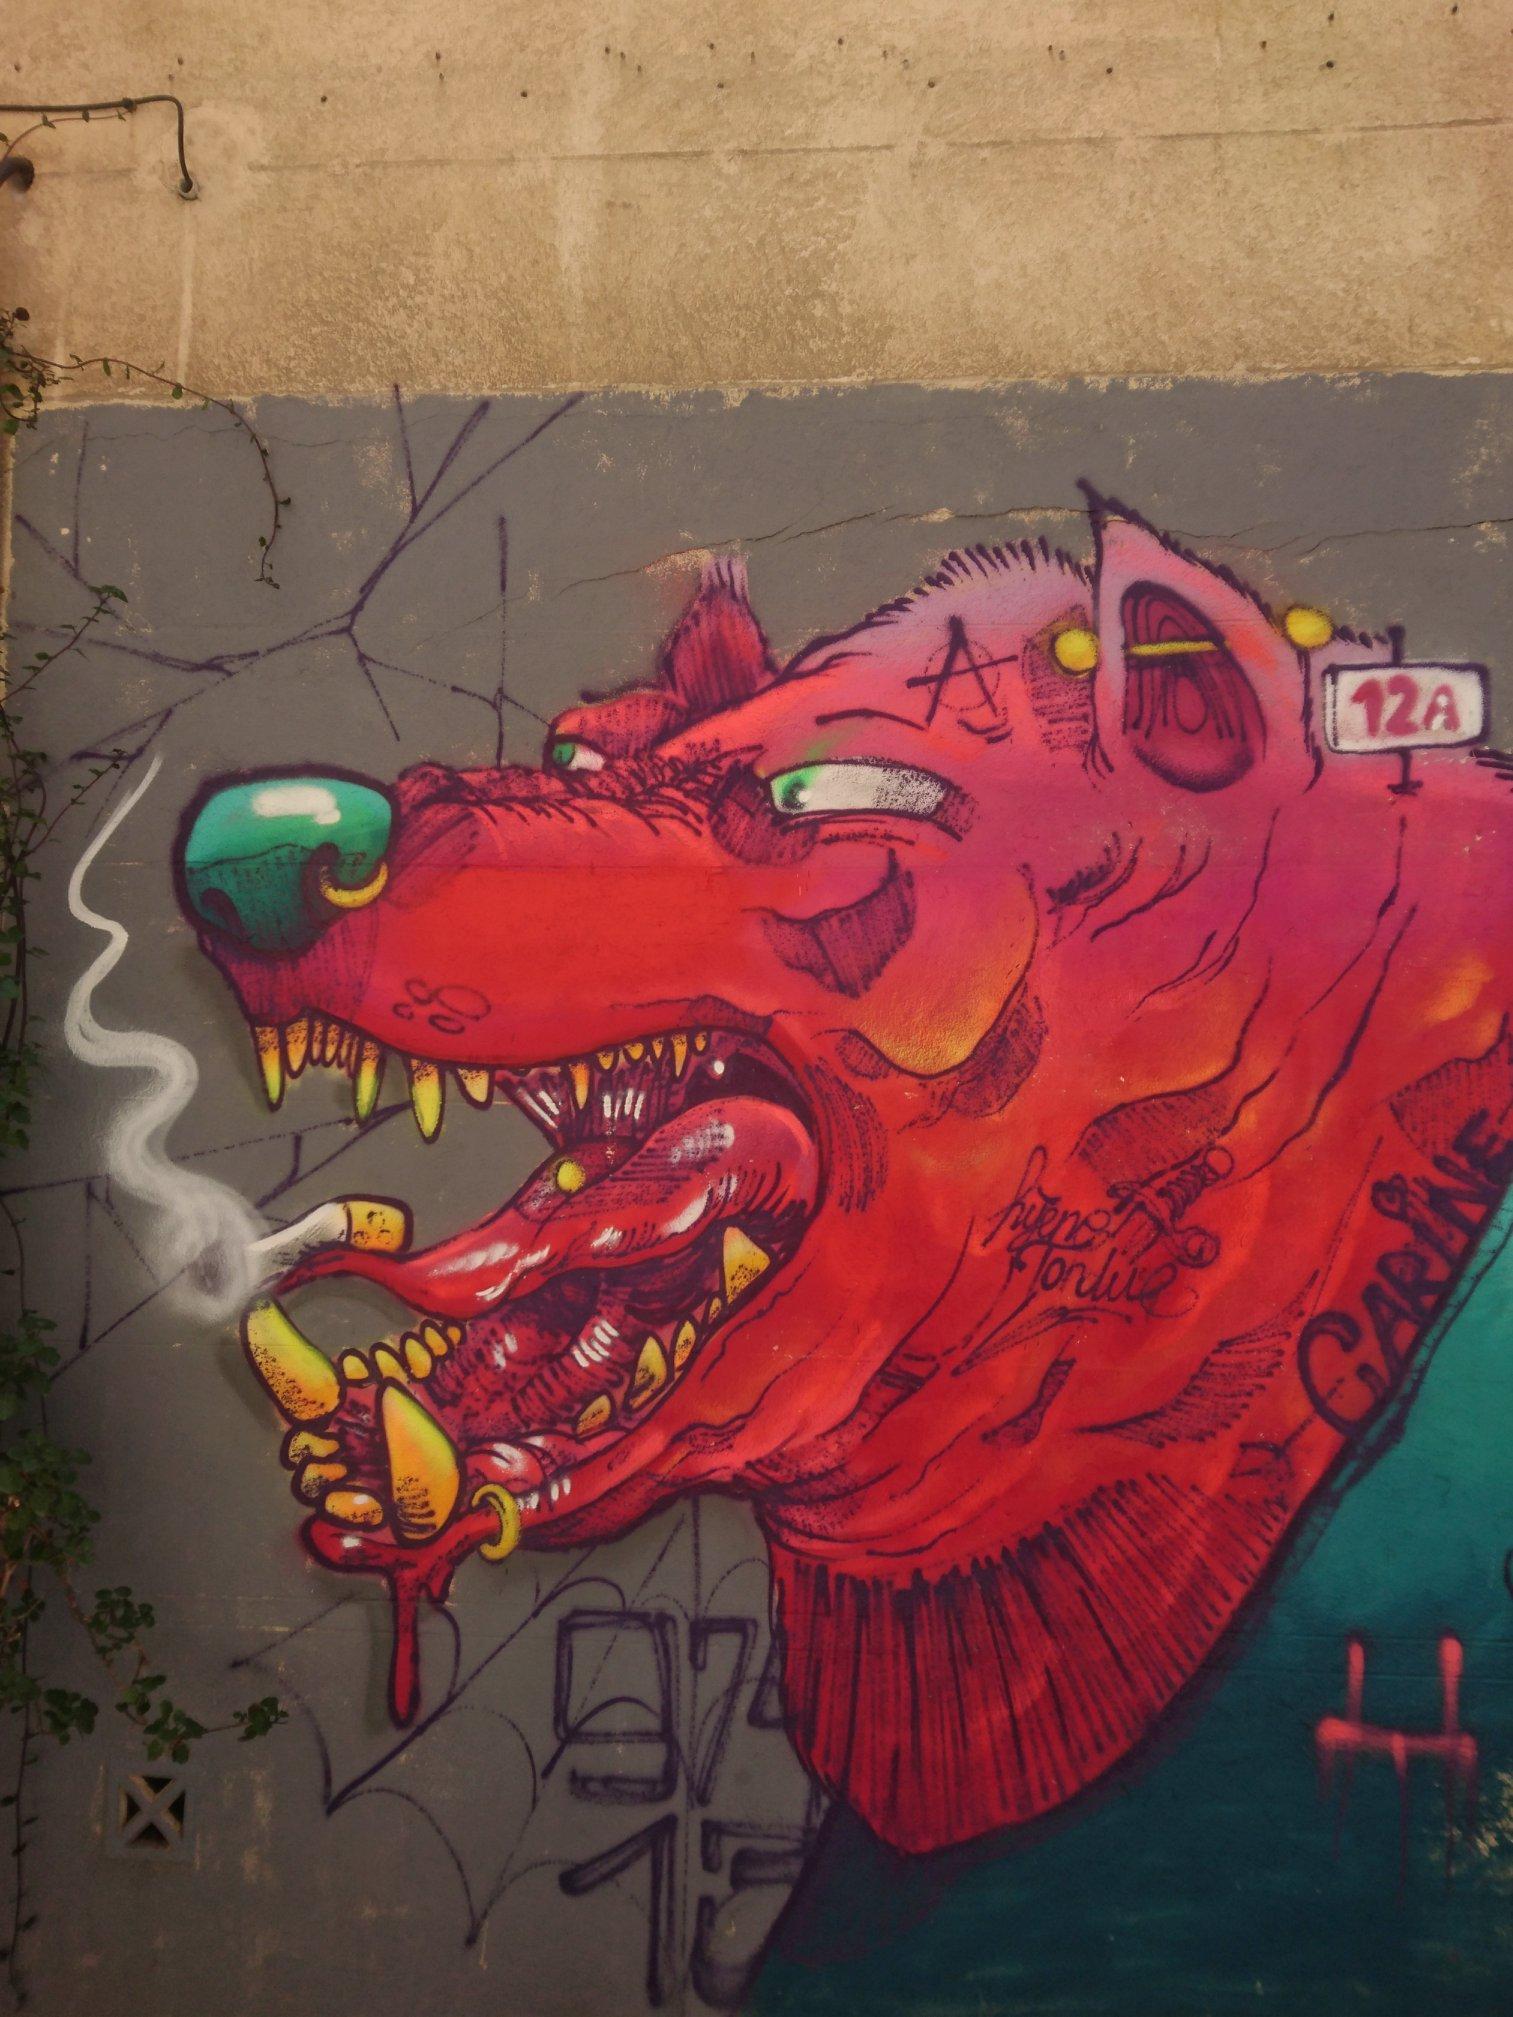 Mural Street Art, Marseille, France